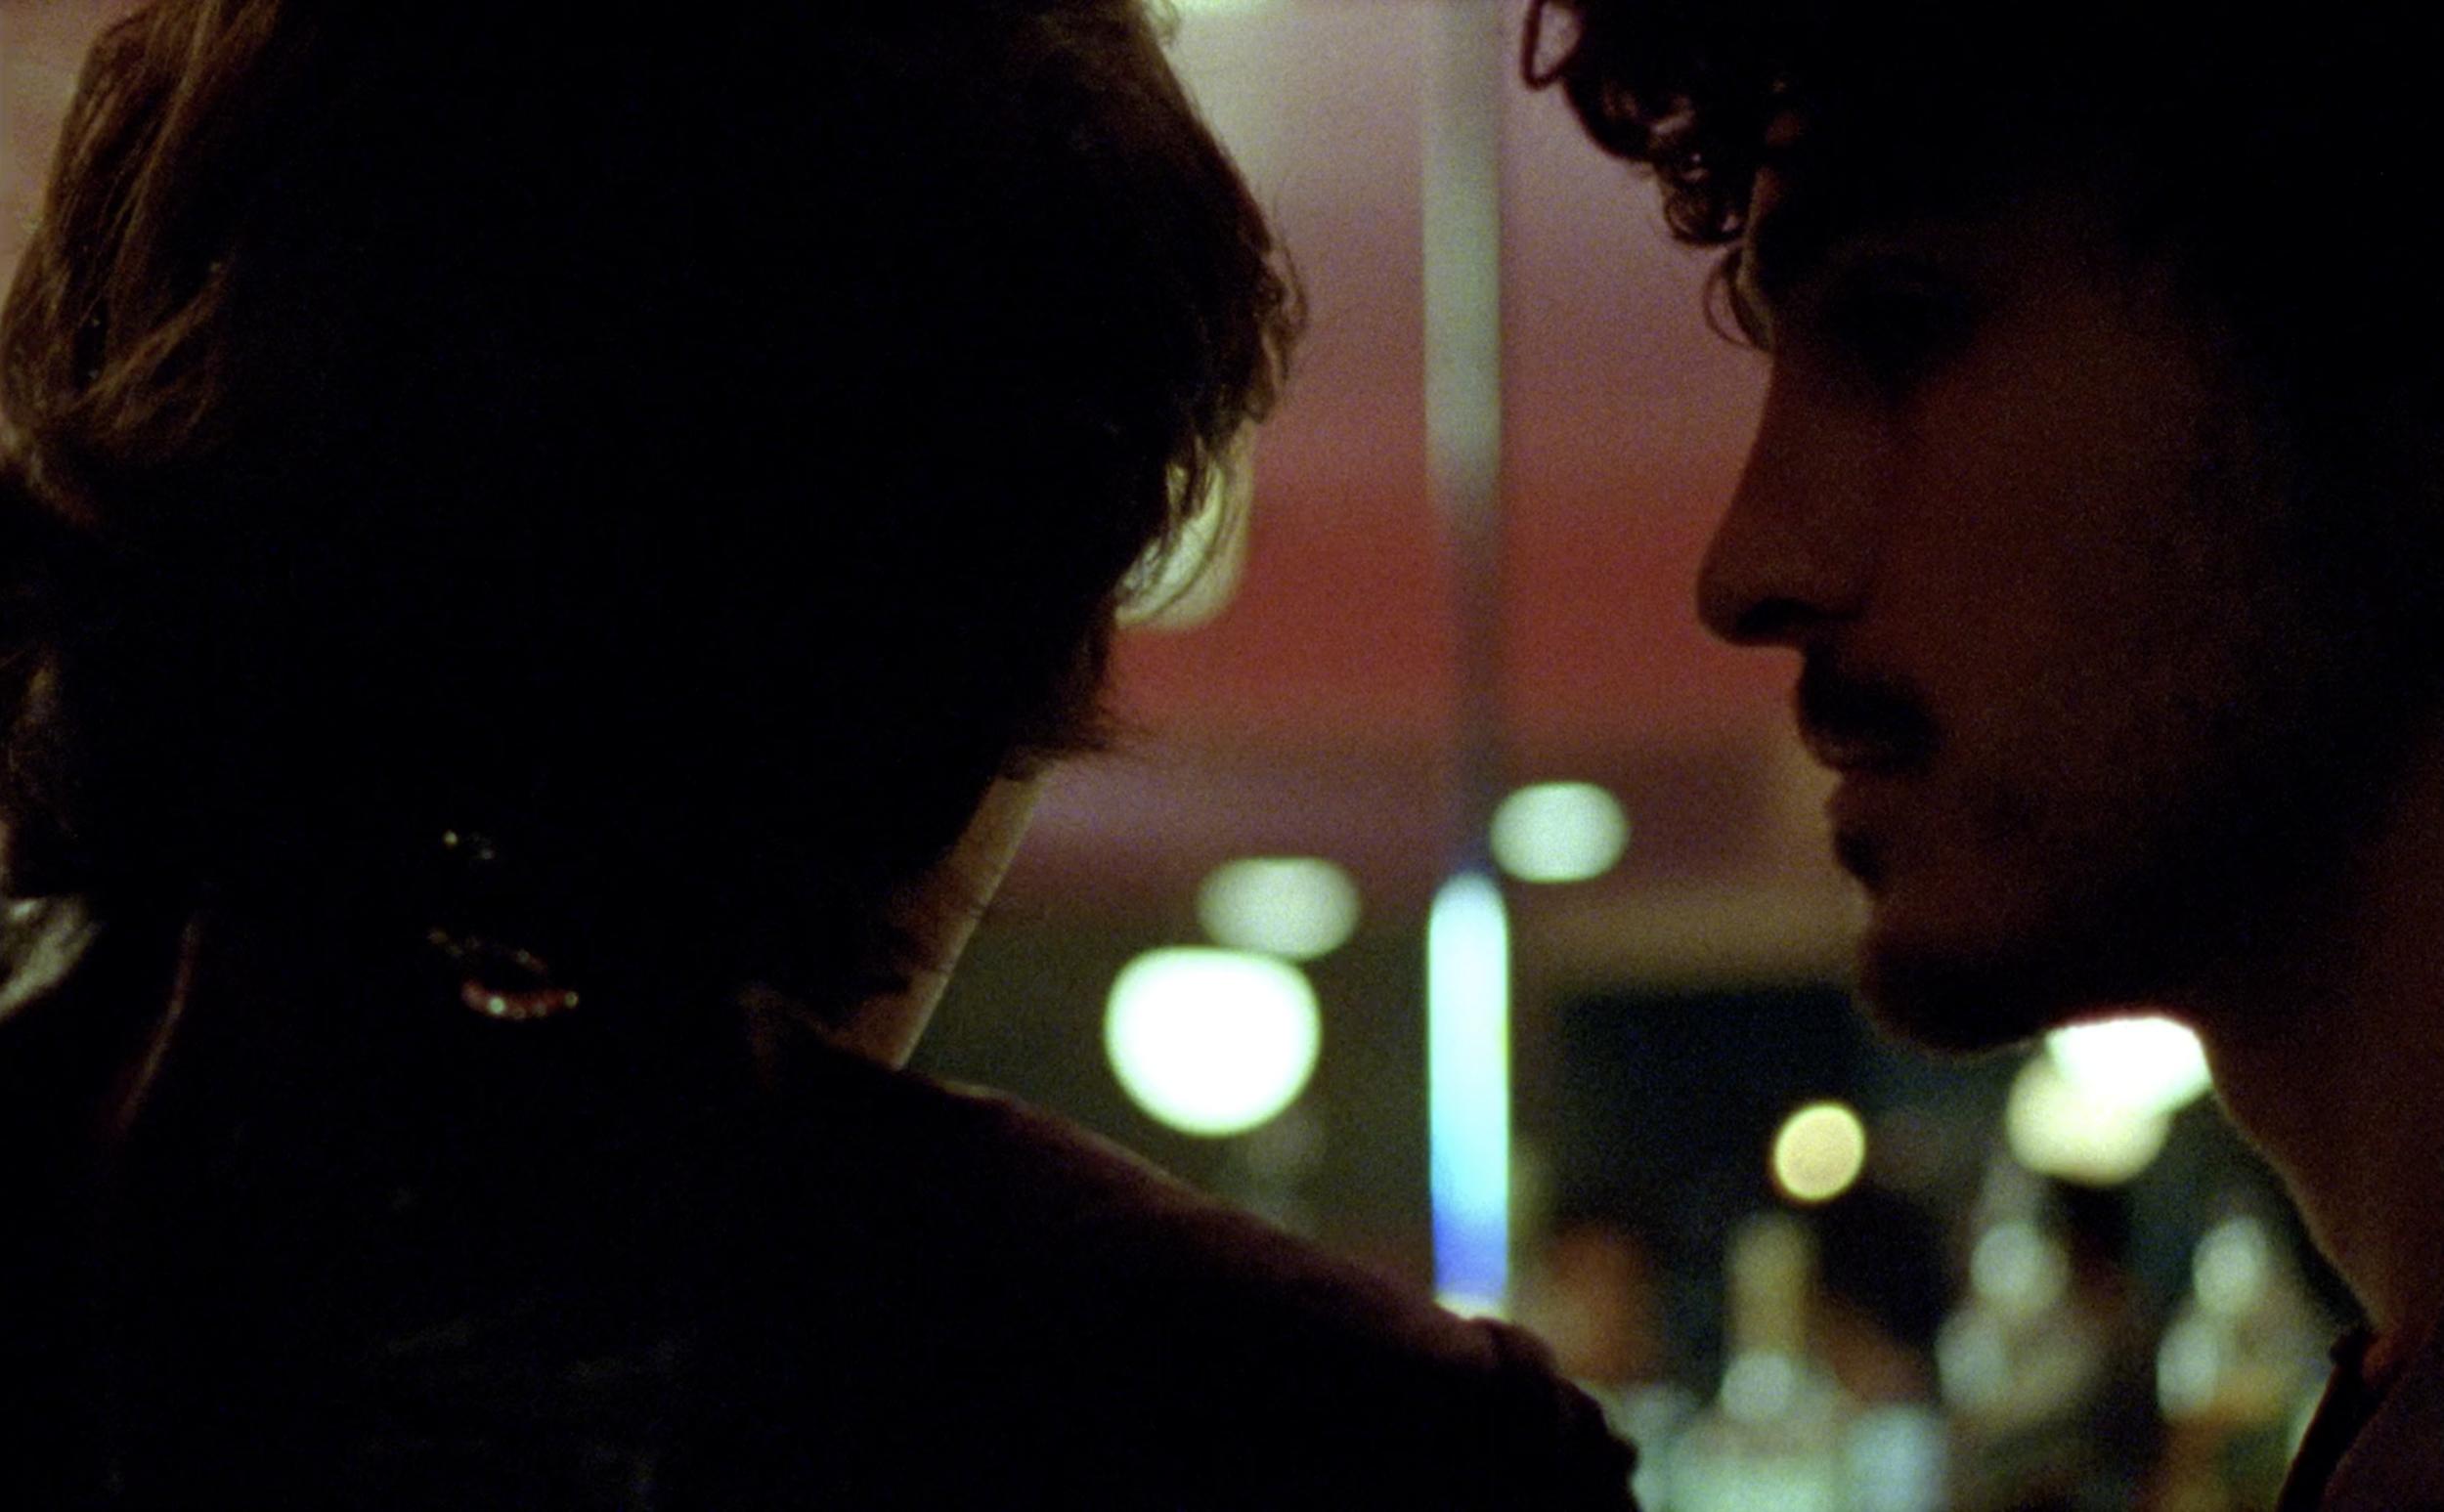 BIRTH'S LATEST OFFERING 'HOMME BOY' - Directed by Alex Nazari